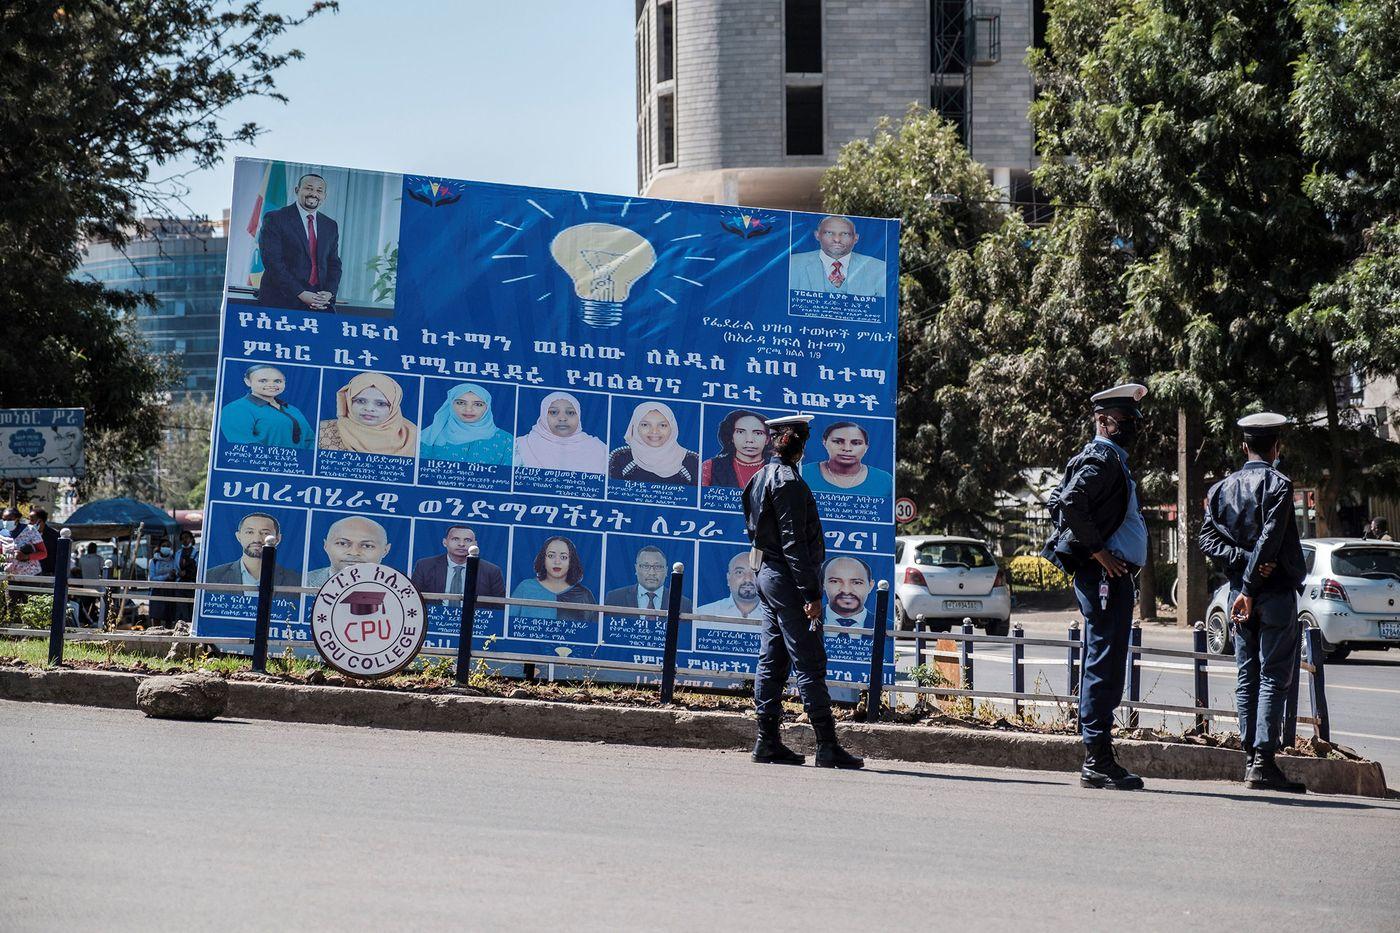 Ethiopia Under Pressure of Election Deadline, Mulls Postponement